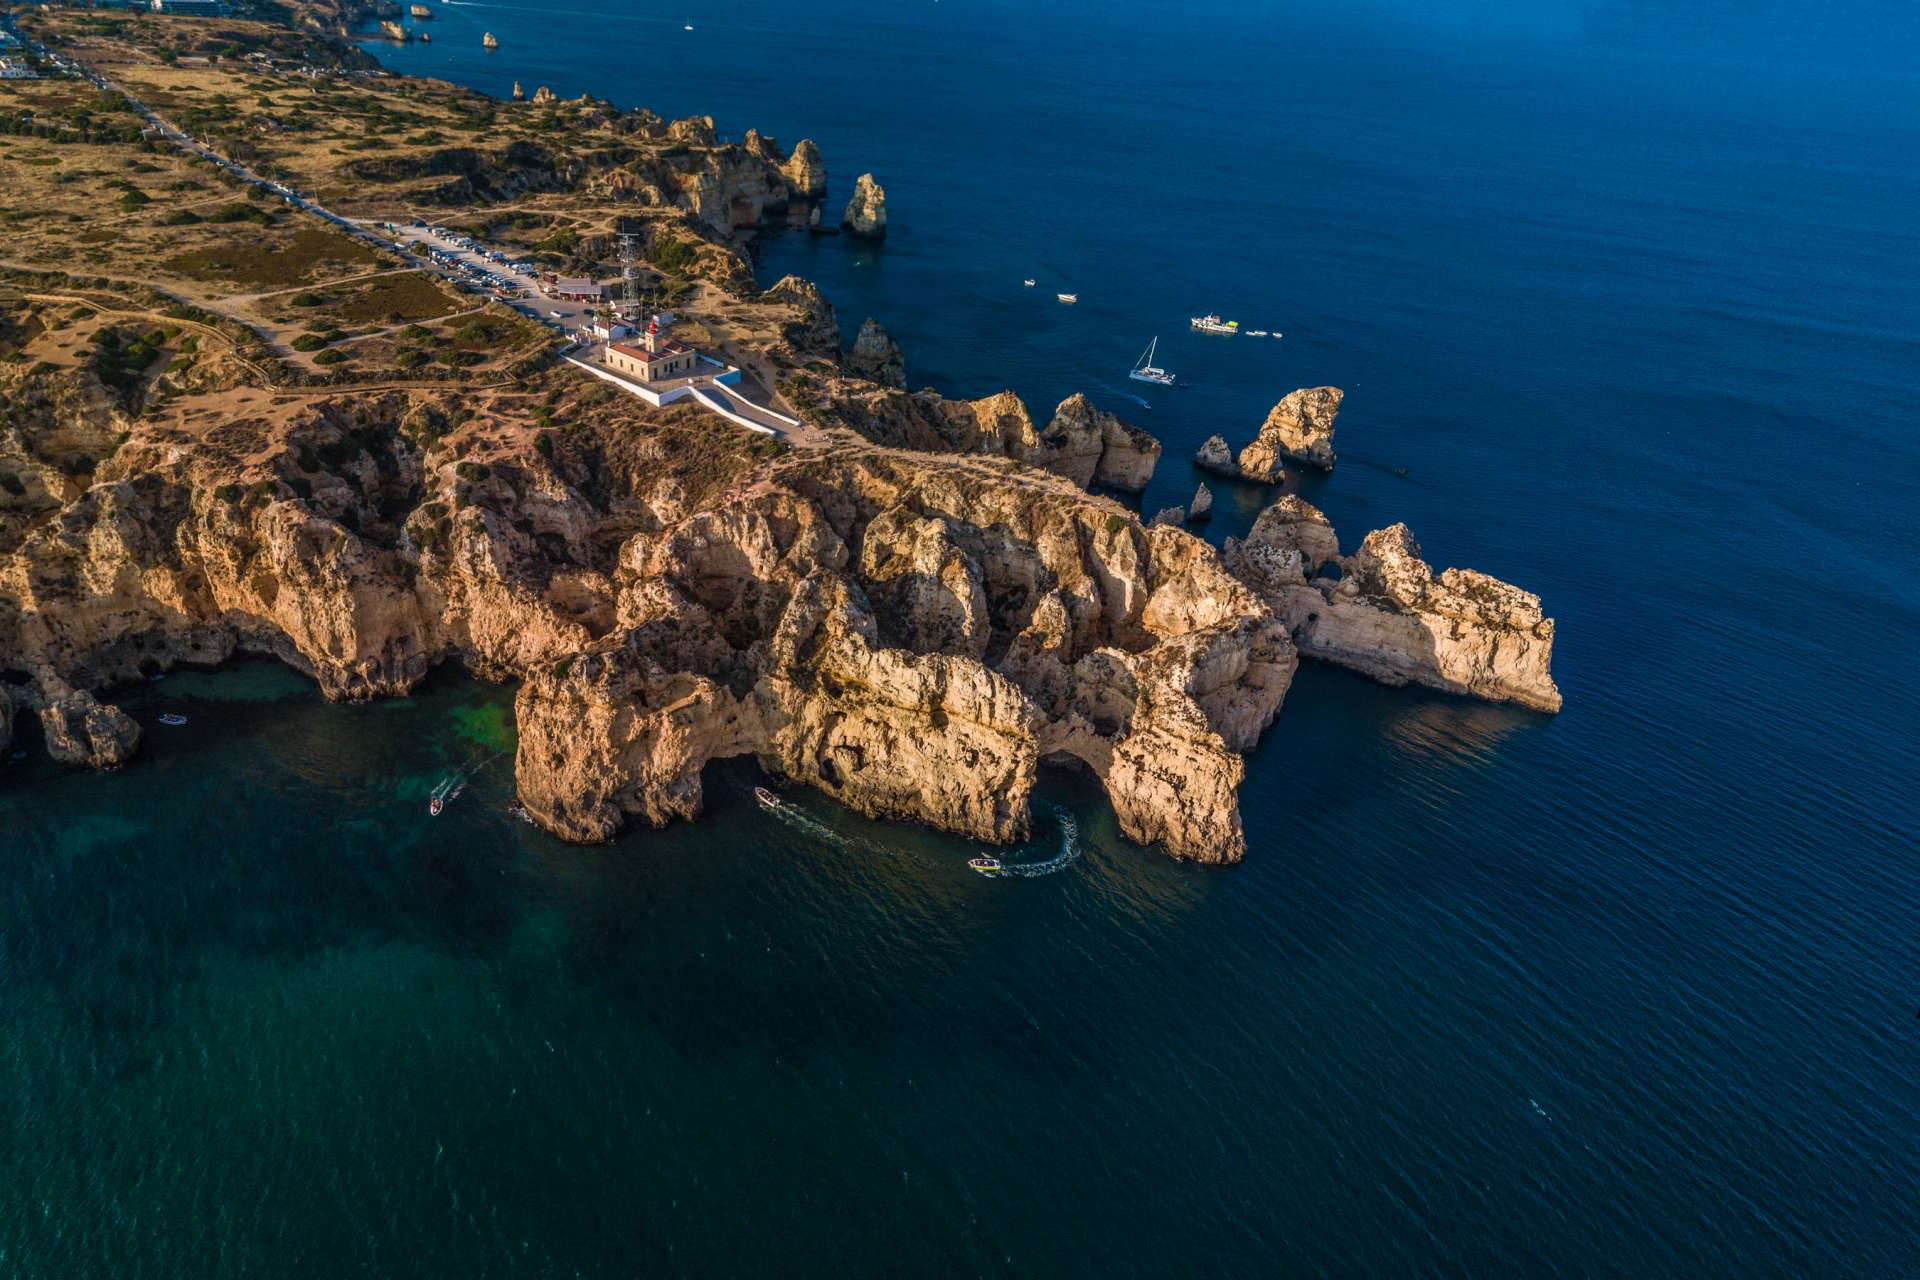 Algarve From Above Drone Photography Enrico Pescantini Farolda Ponta da Piedade